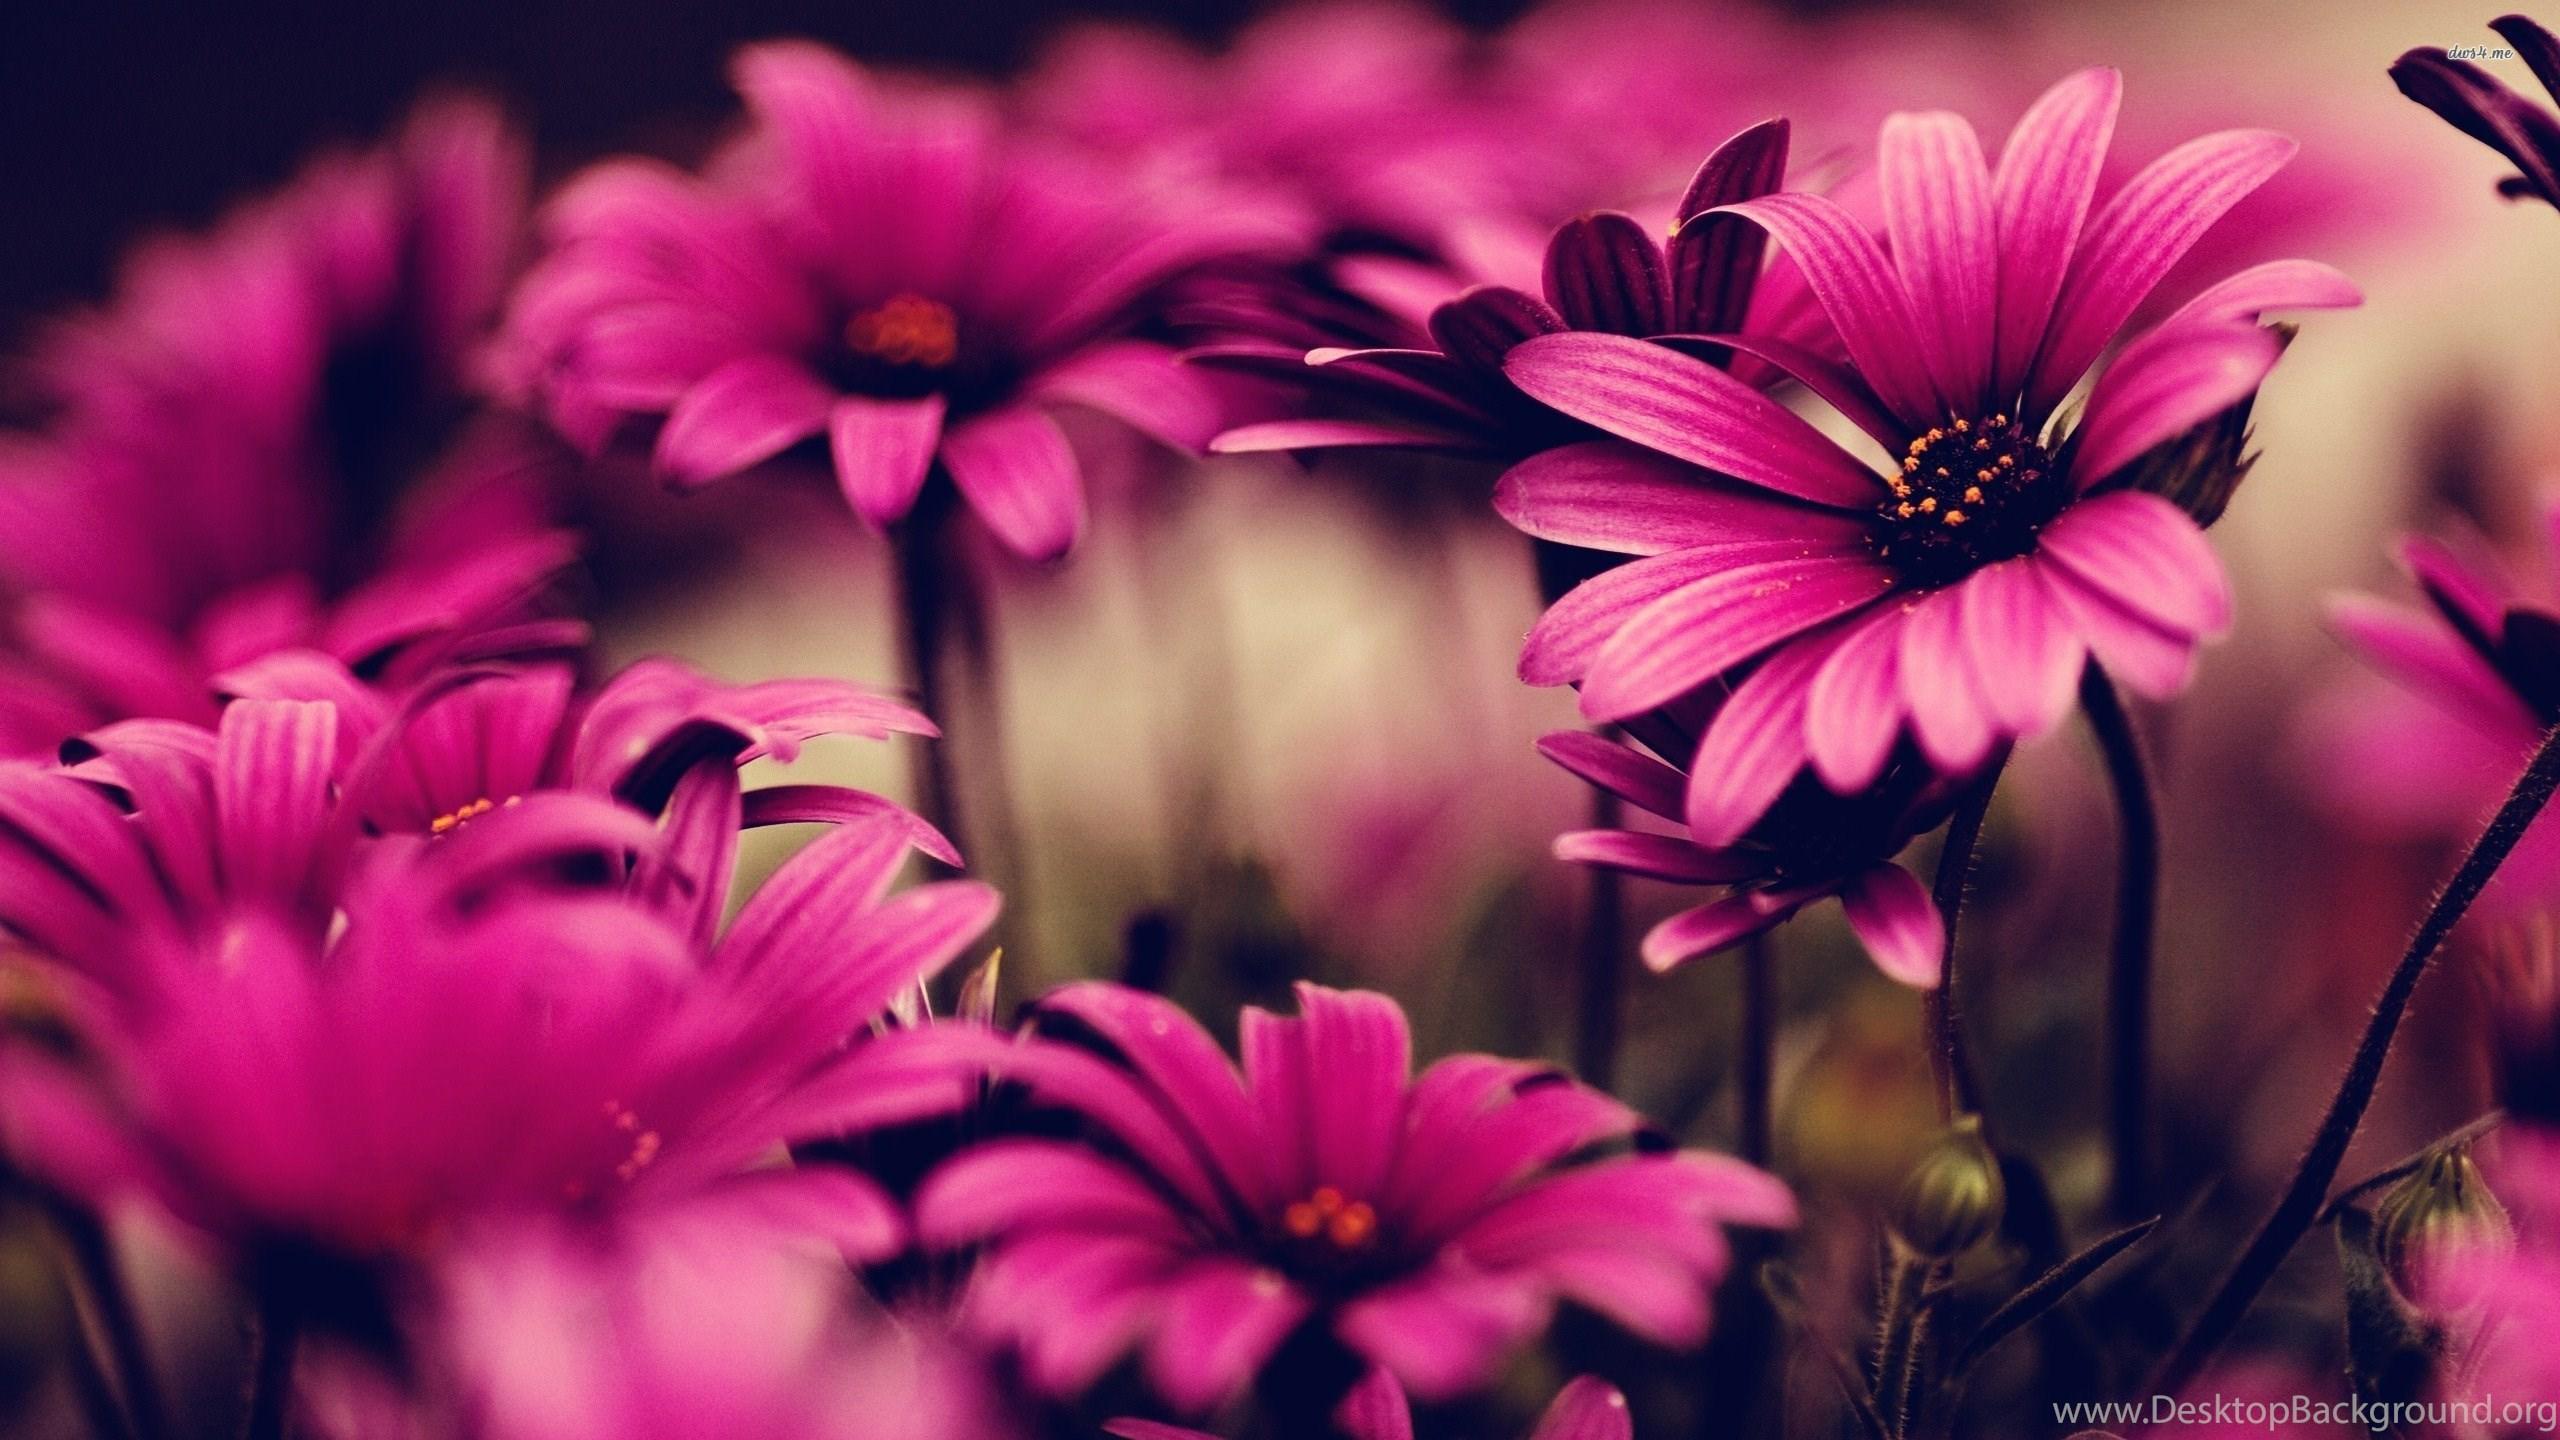 wallpapers godfather fb covers flowers fond ecran hd 2560x1440